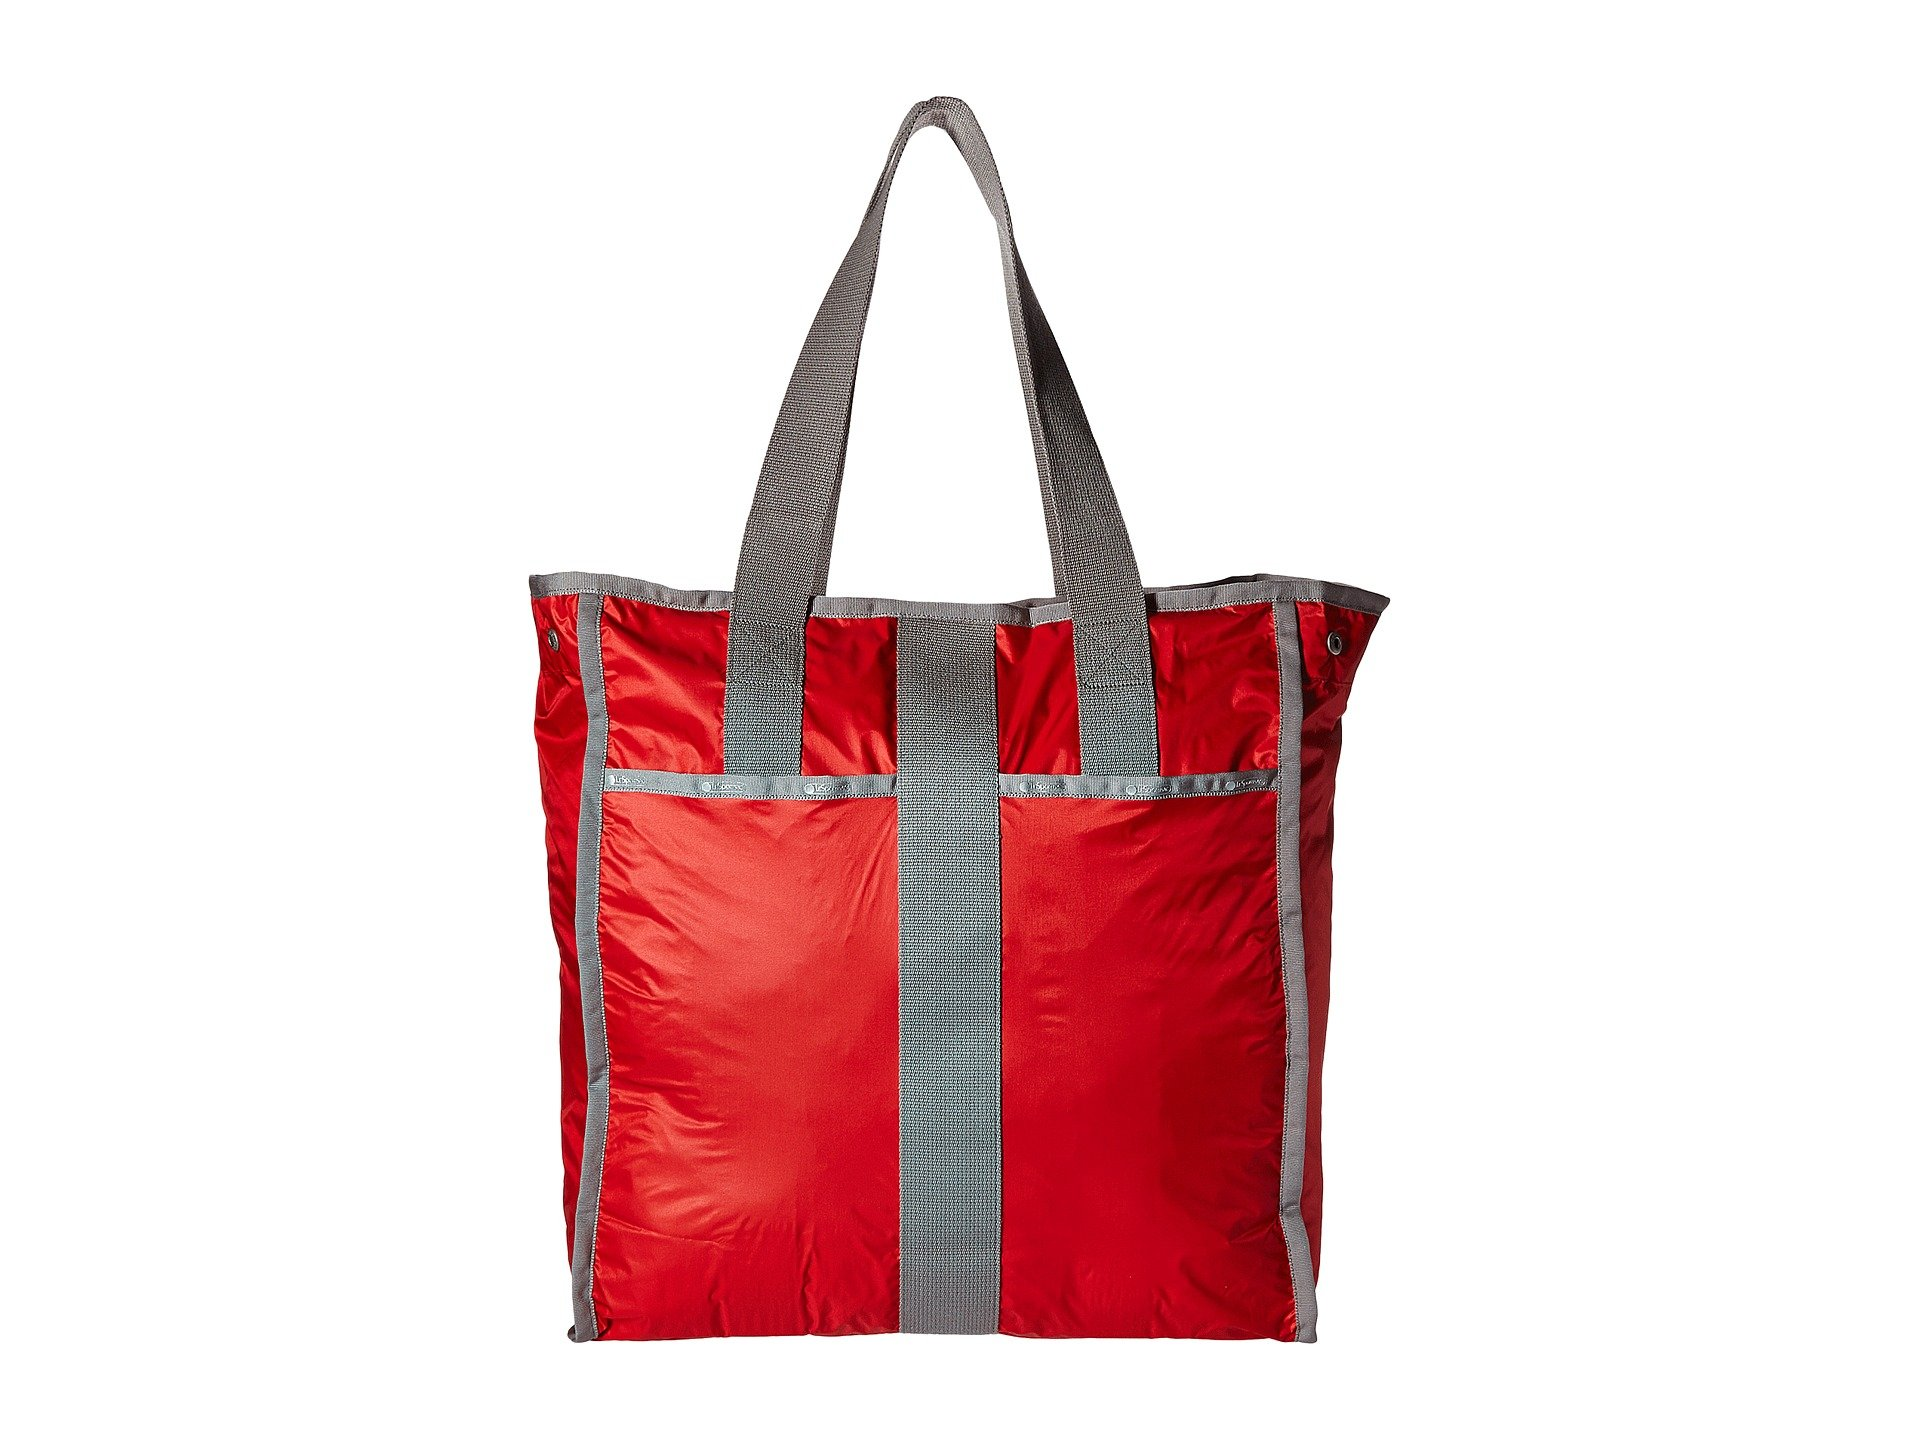 Bolso de Viaje para Mujer LeSportsac Luggage Large City Tote  + LeSportsac en VeoyCompro.net